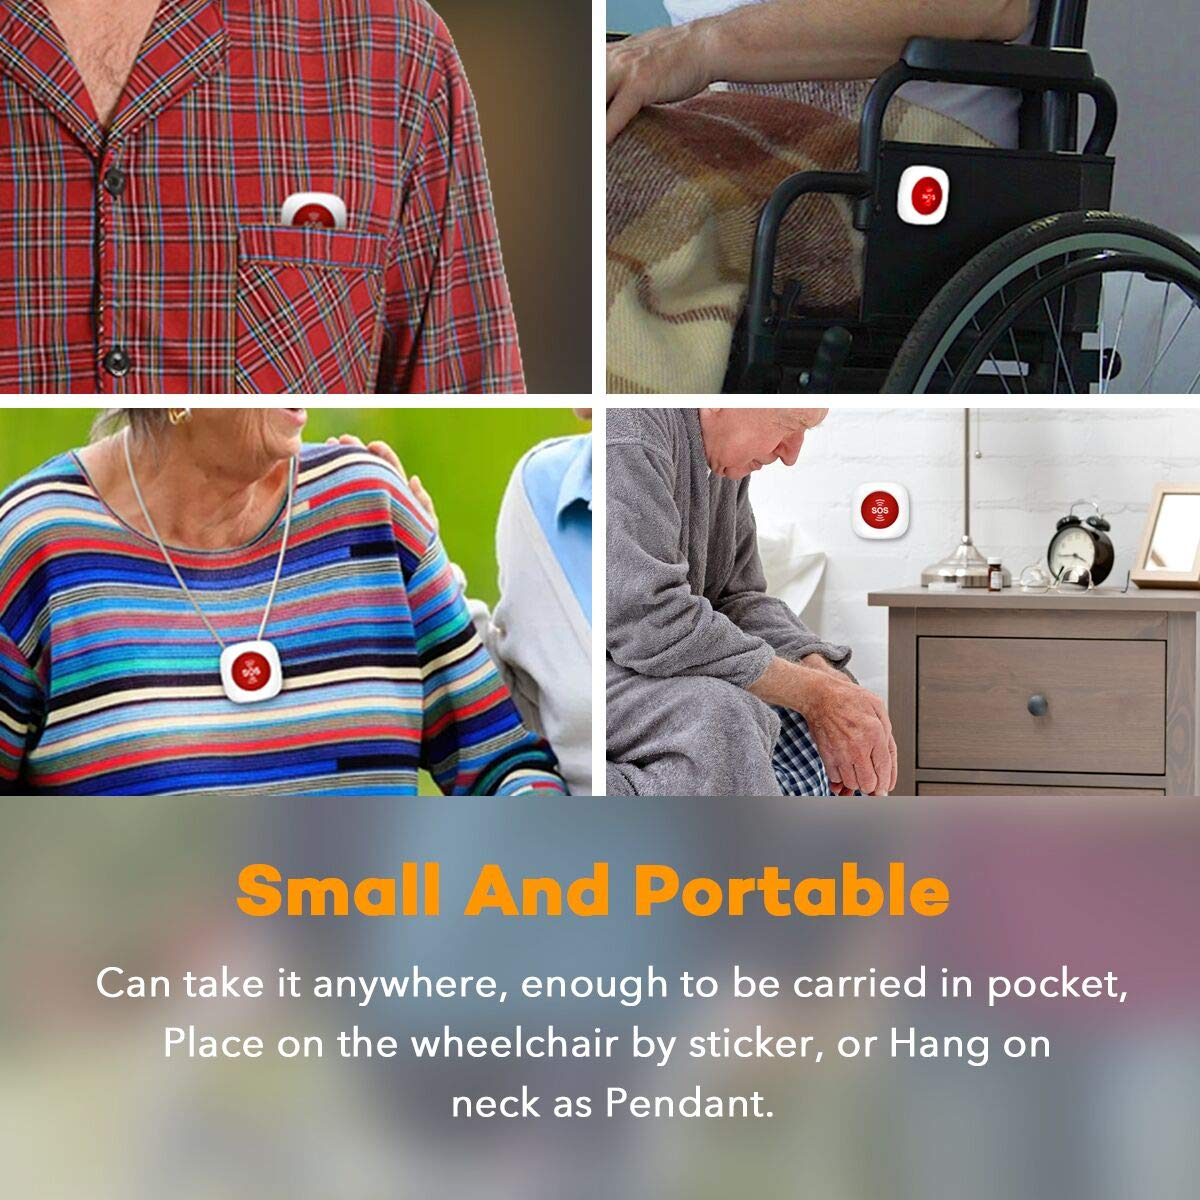 Amazon com: KUCHOOWHA Wireless Caregiver Pager Receiver - GSM SIM